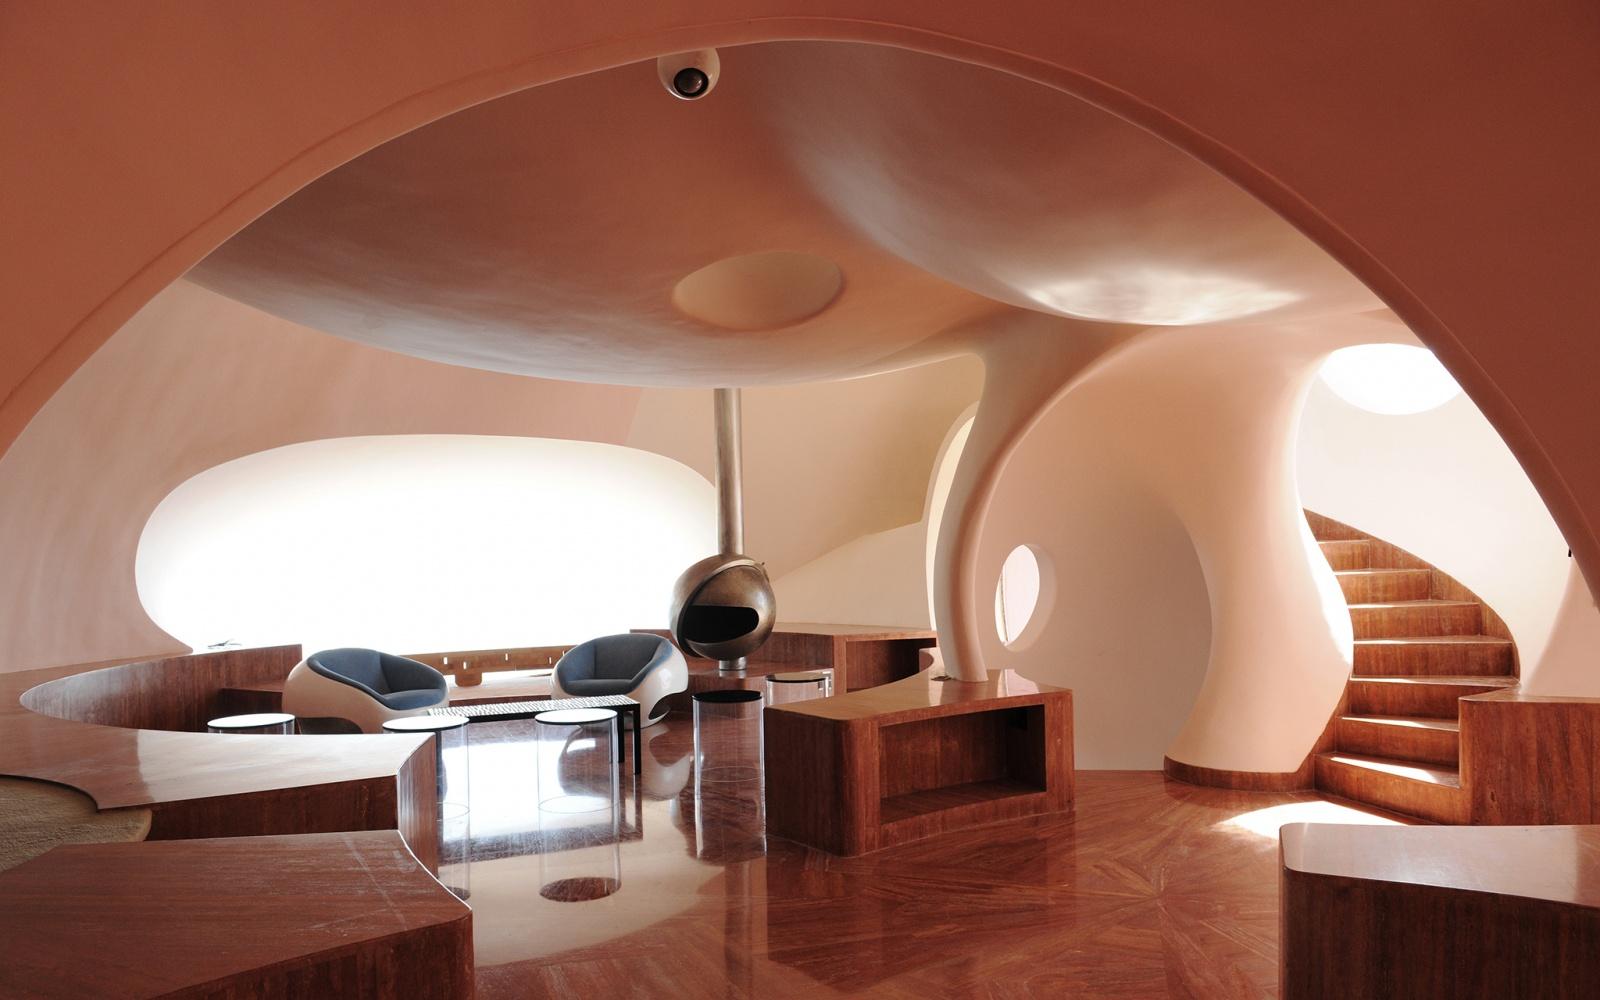 bubbles0515-homes-palais-bulles-interior.jpg